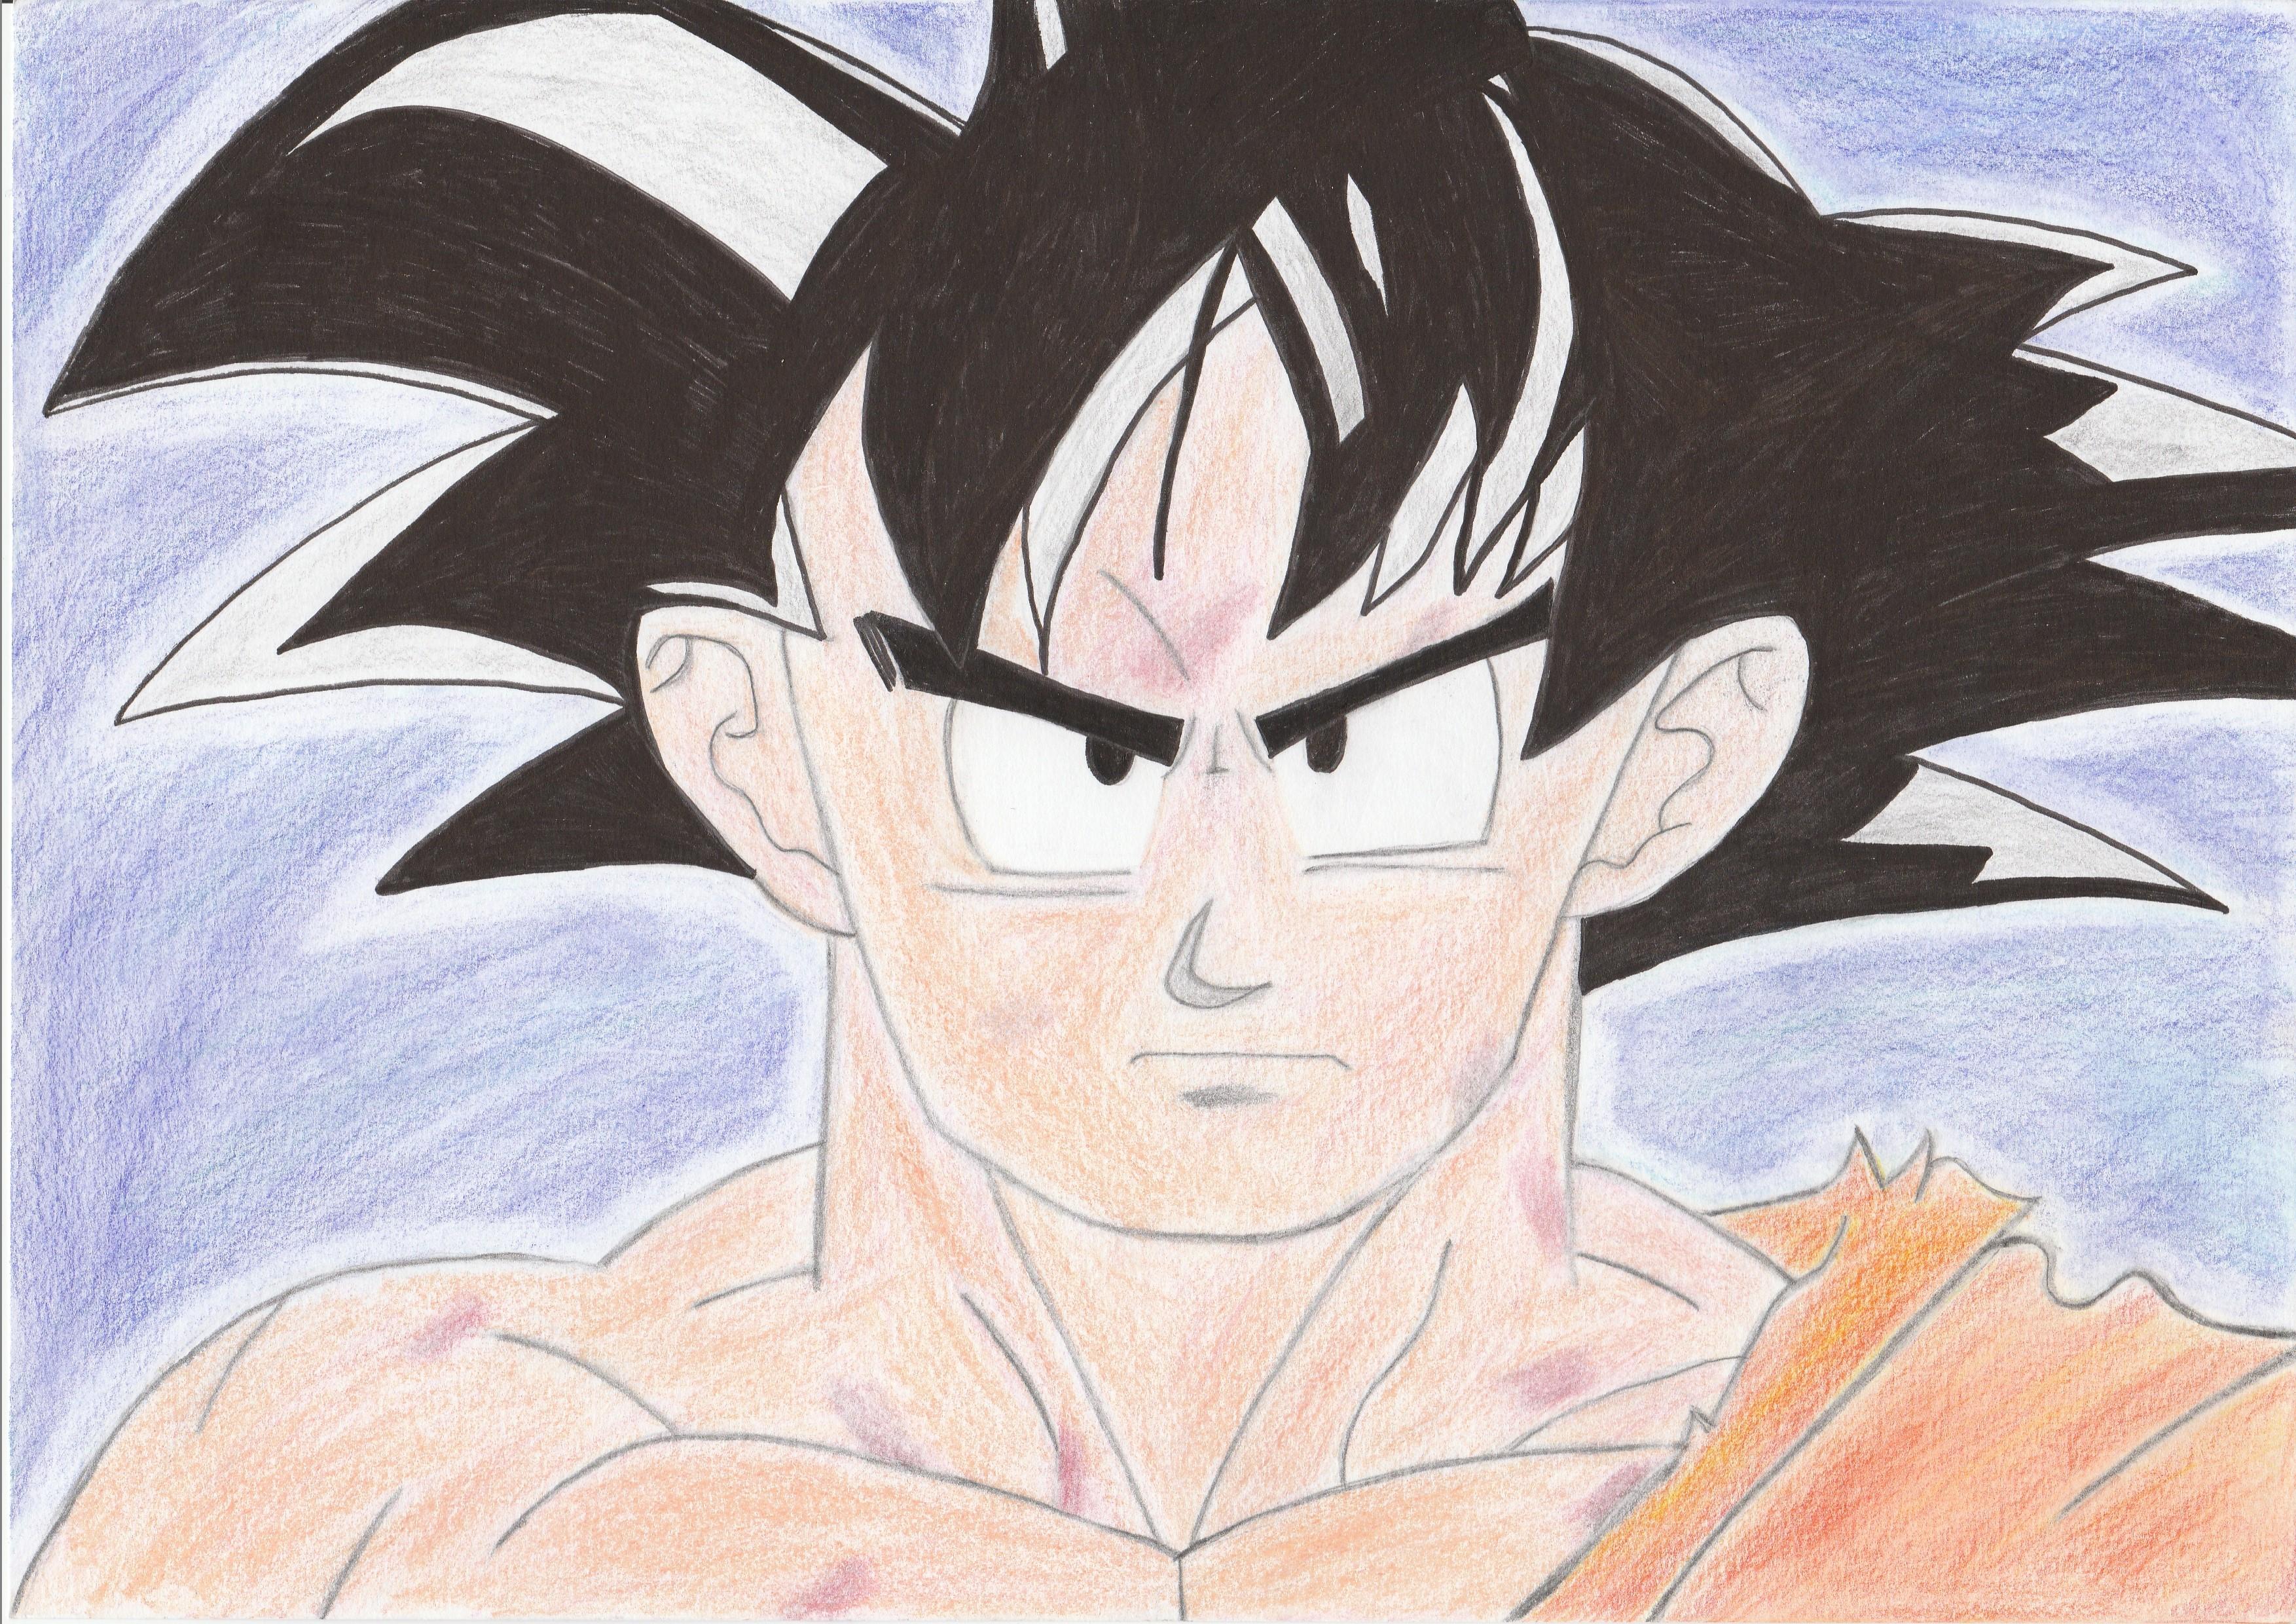 Dessin Son Goku Pencildrawing Fr